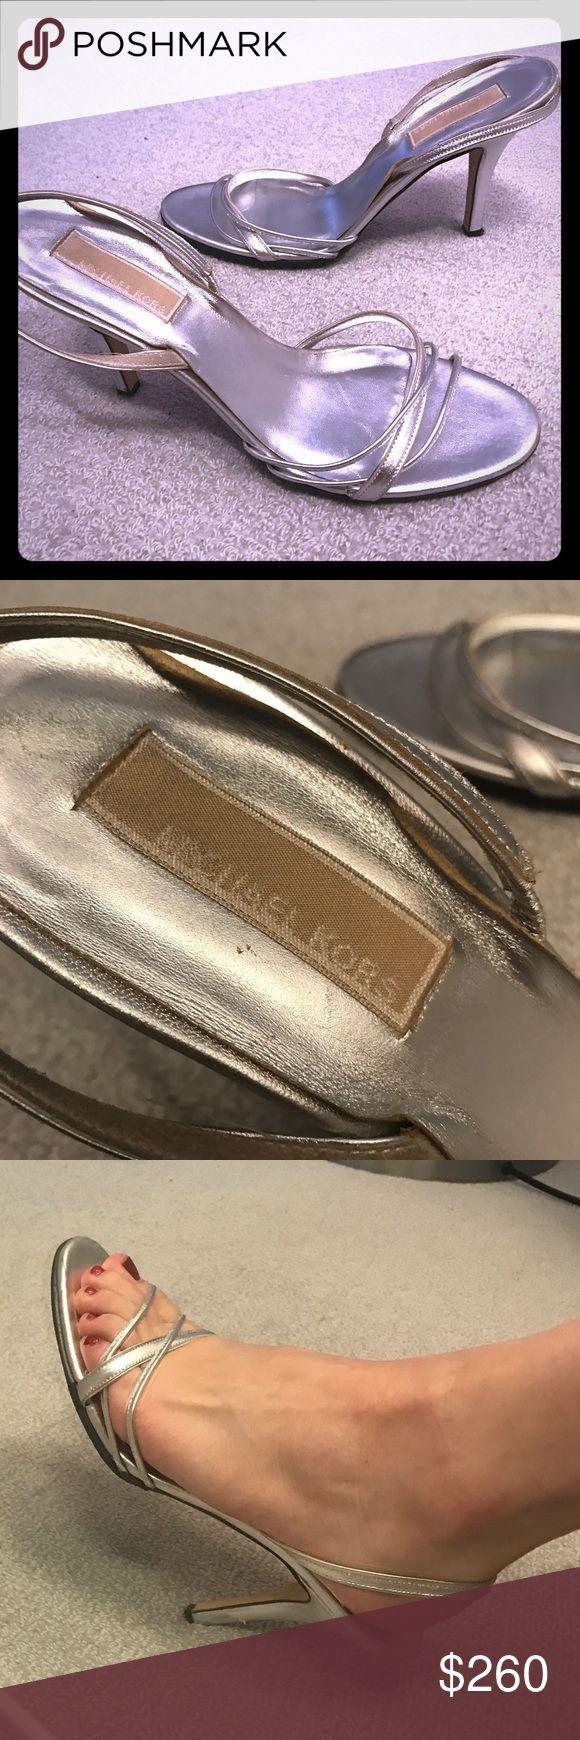 Michael Kors heels Silver strappy Michael Kors heels worn once! Michael Kors Shoes Heels